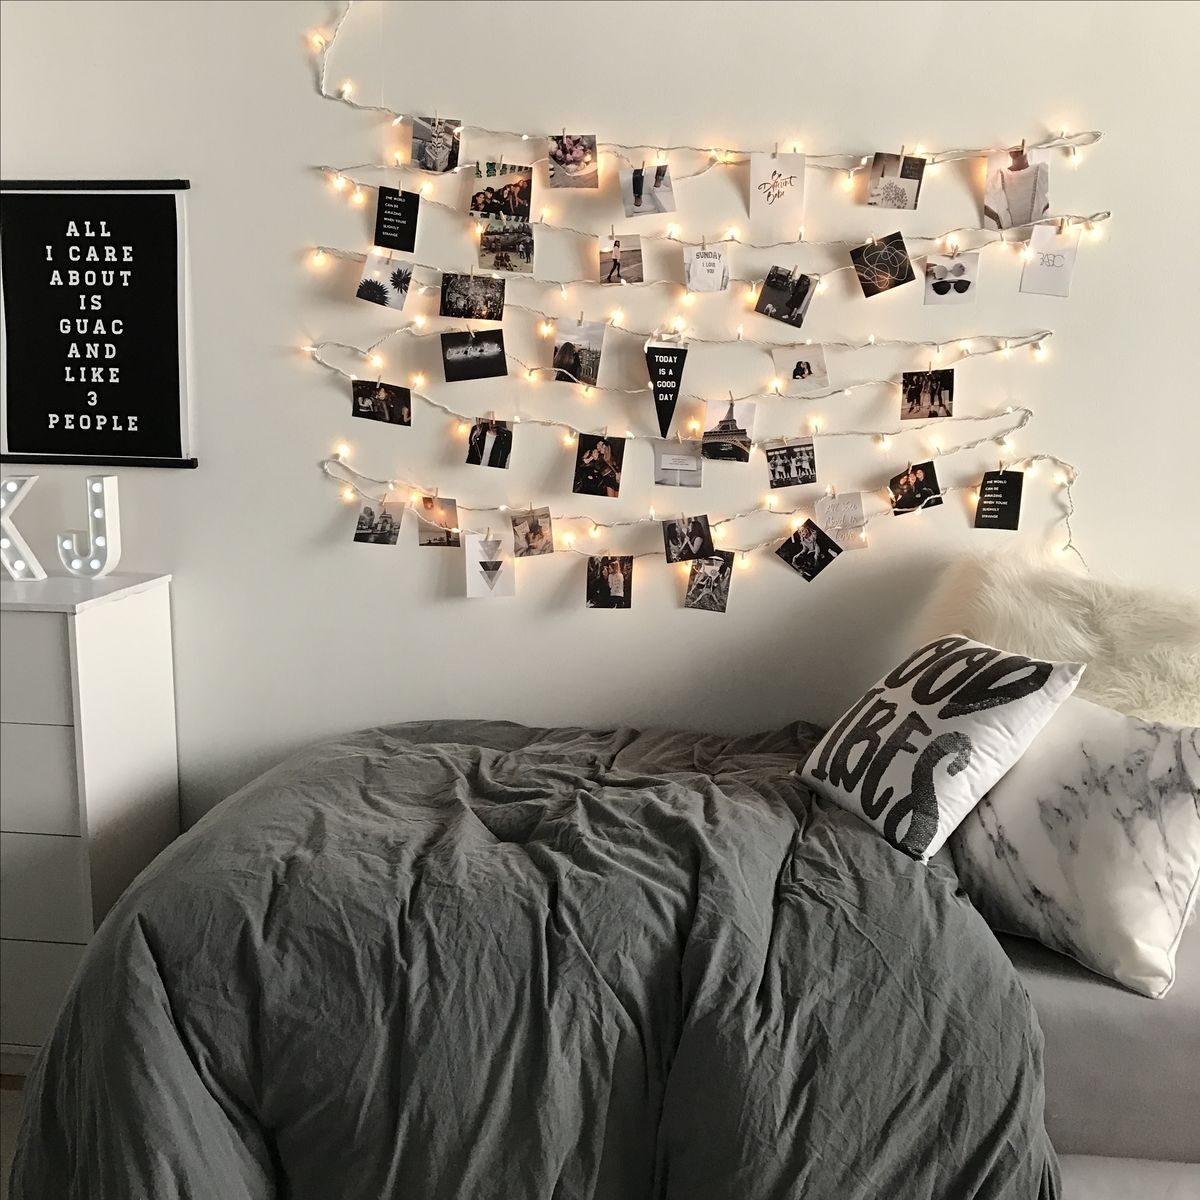 Medium Of Stylish Dorm Rooms